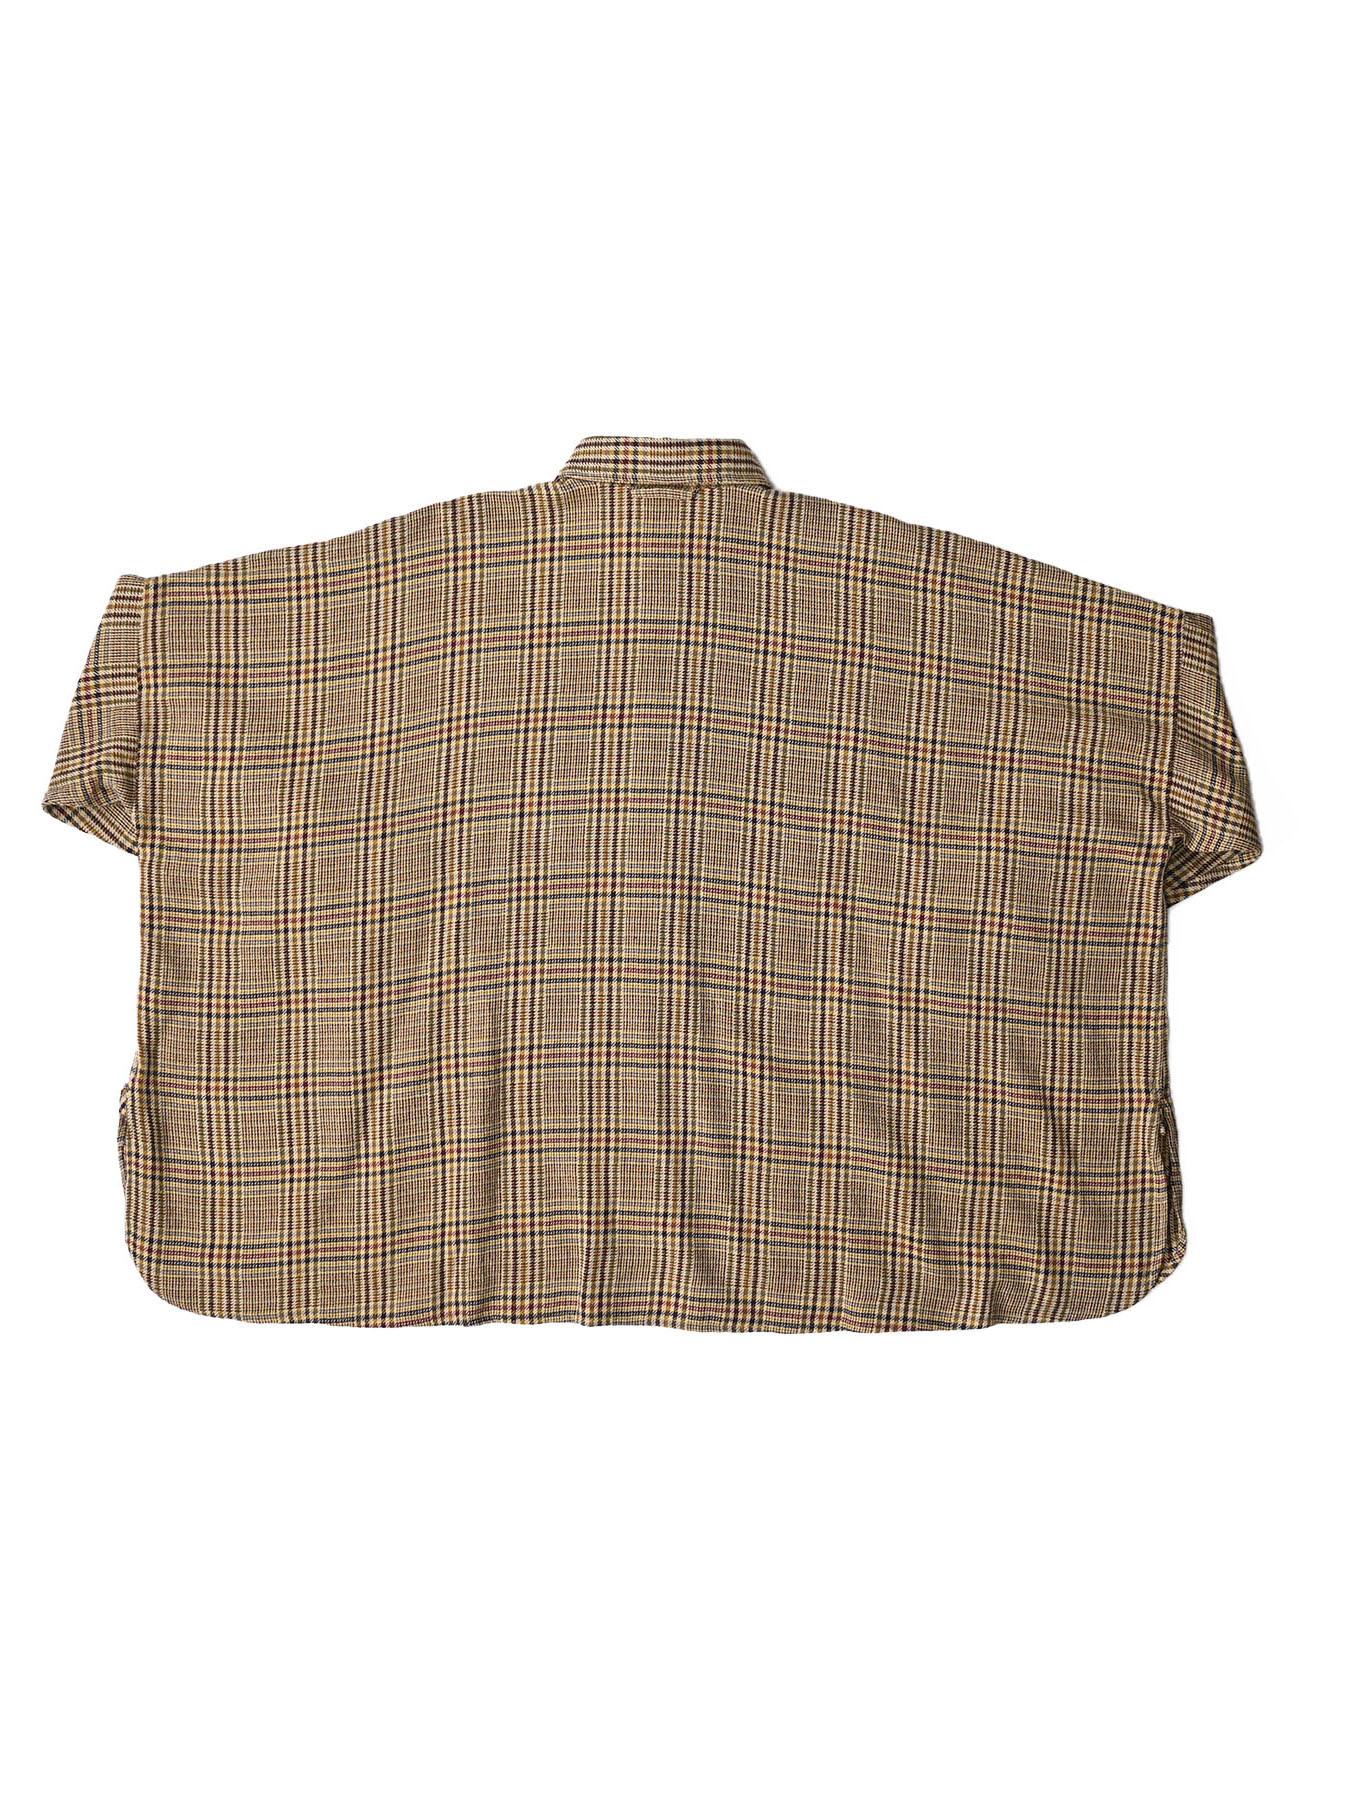 Indian Flannel Big Shirt-12